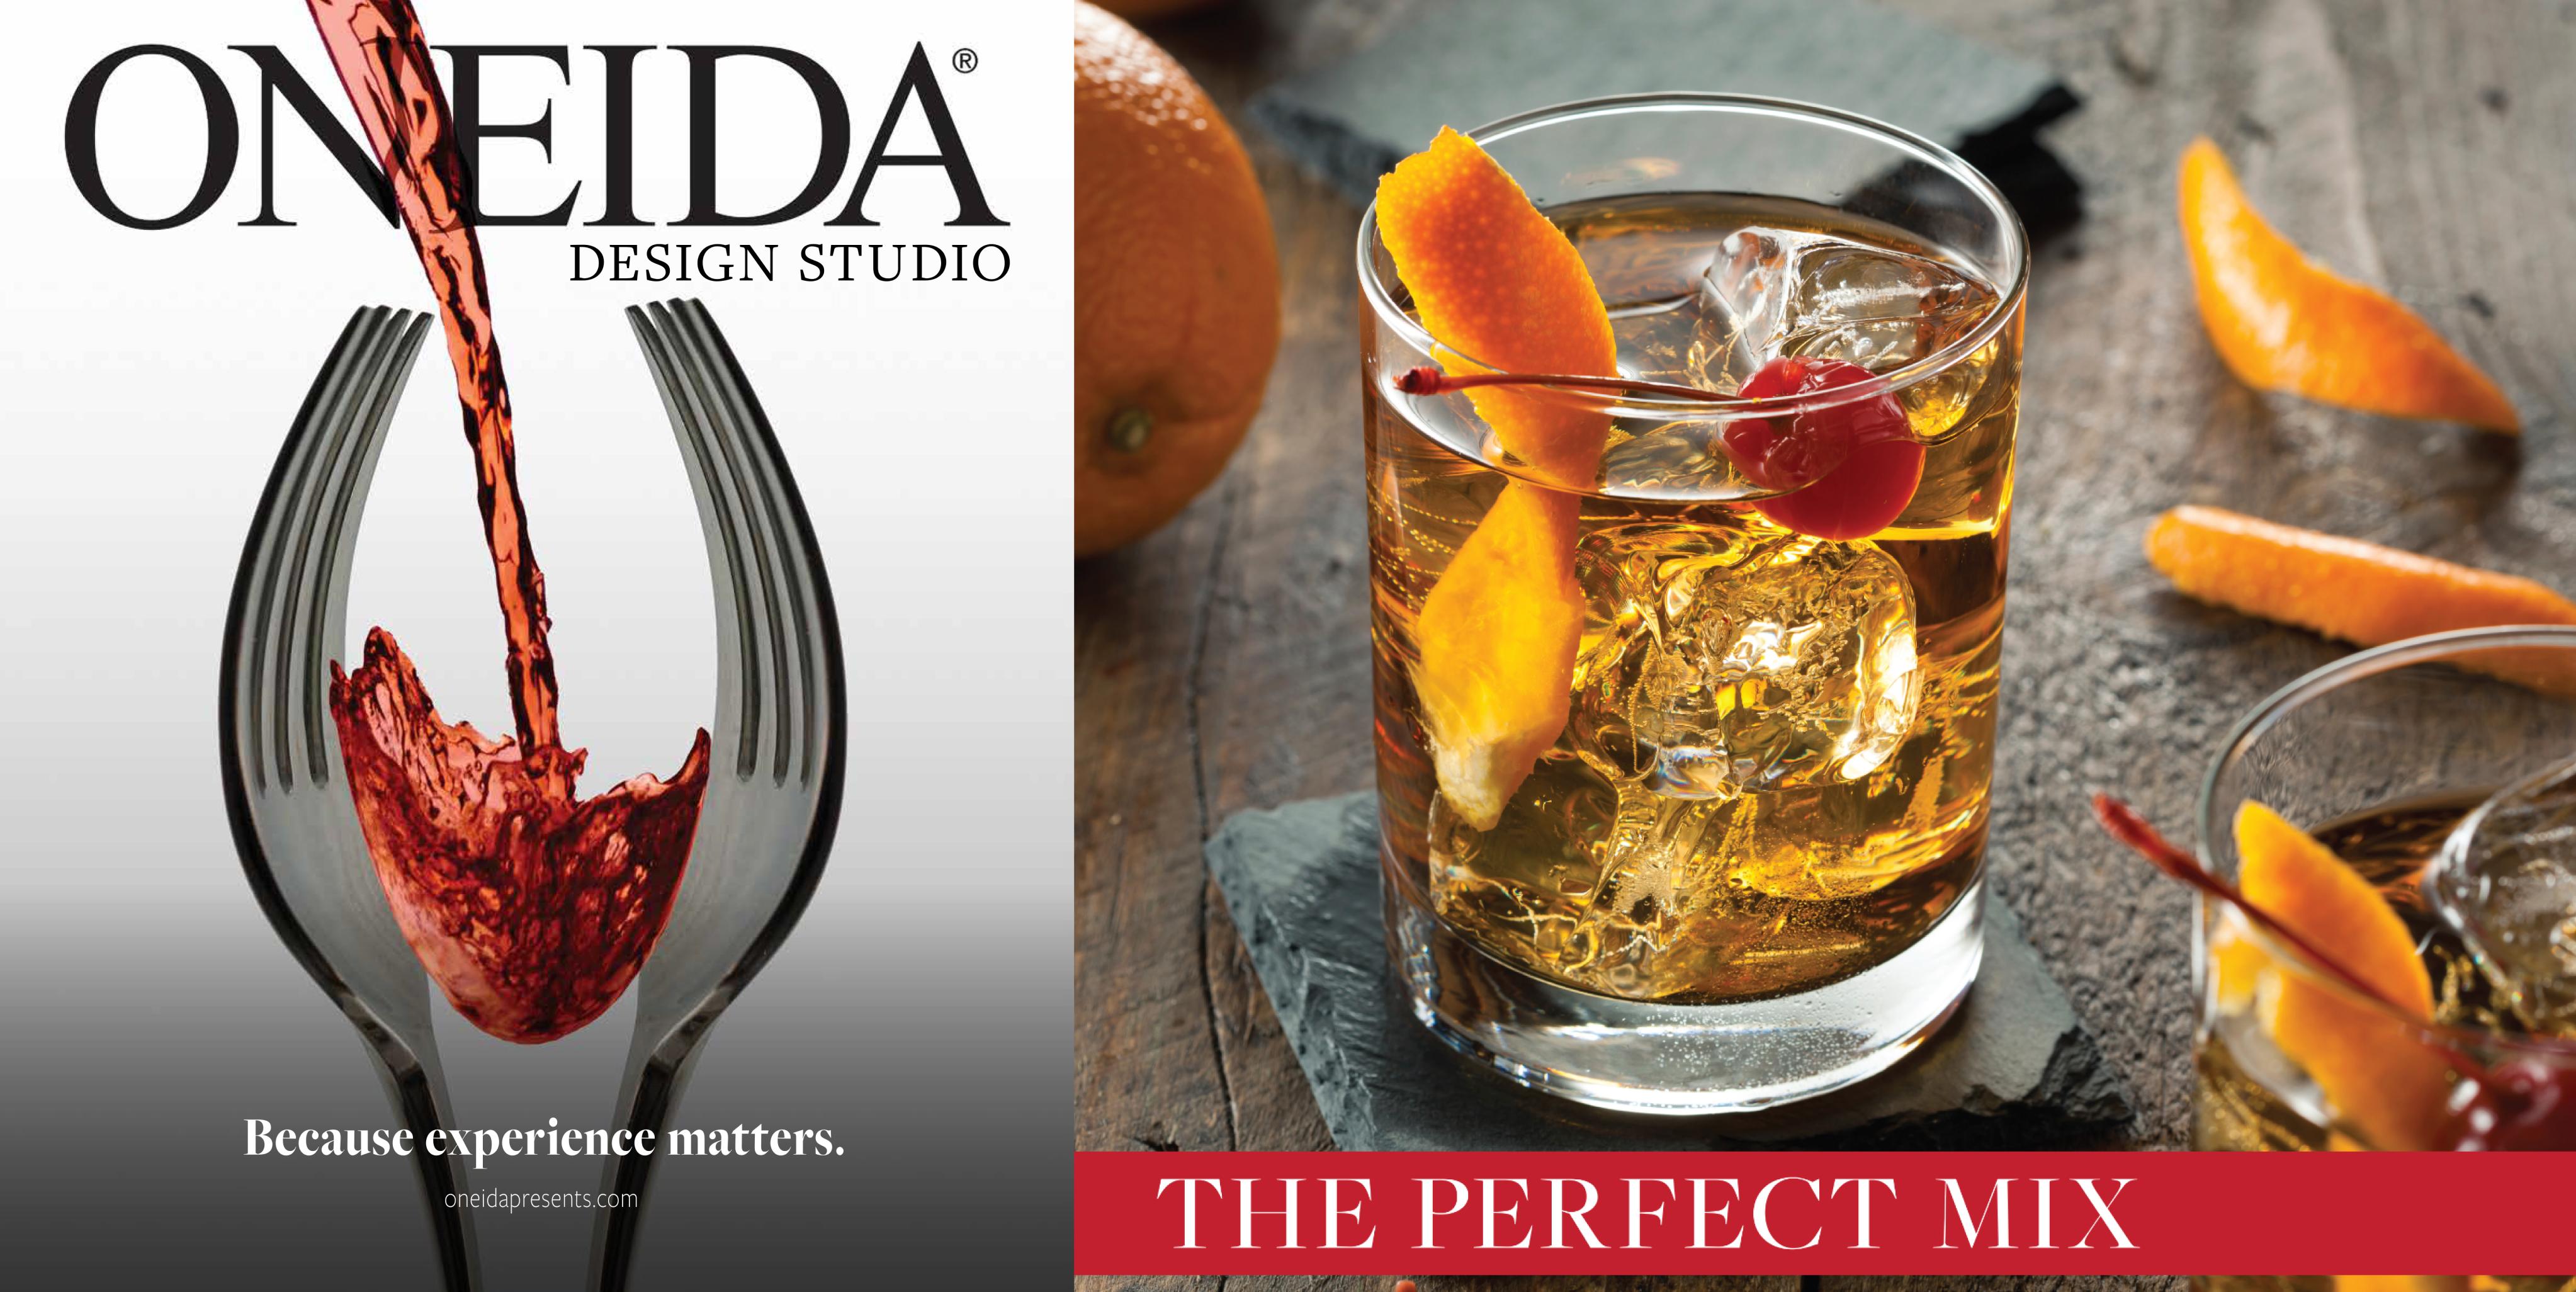 Oneida Design Studio - Cover